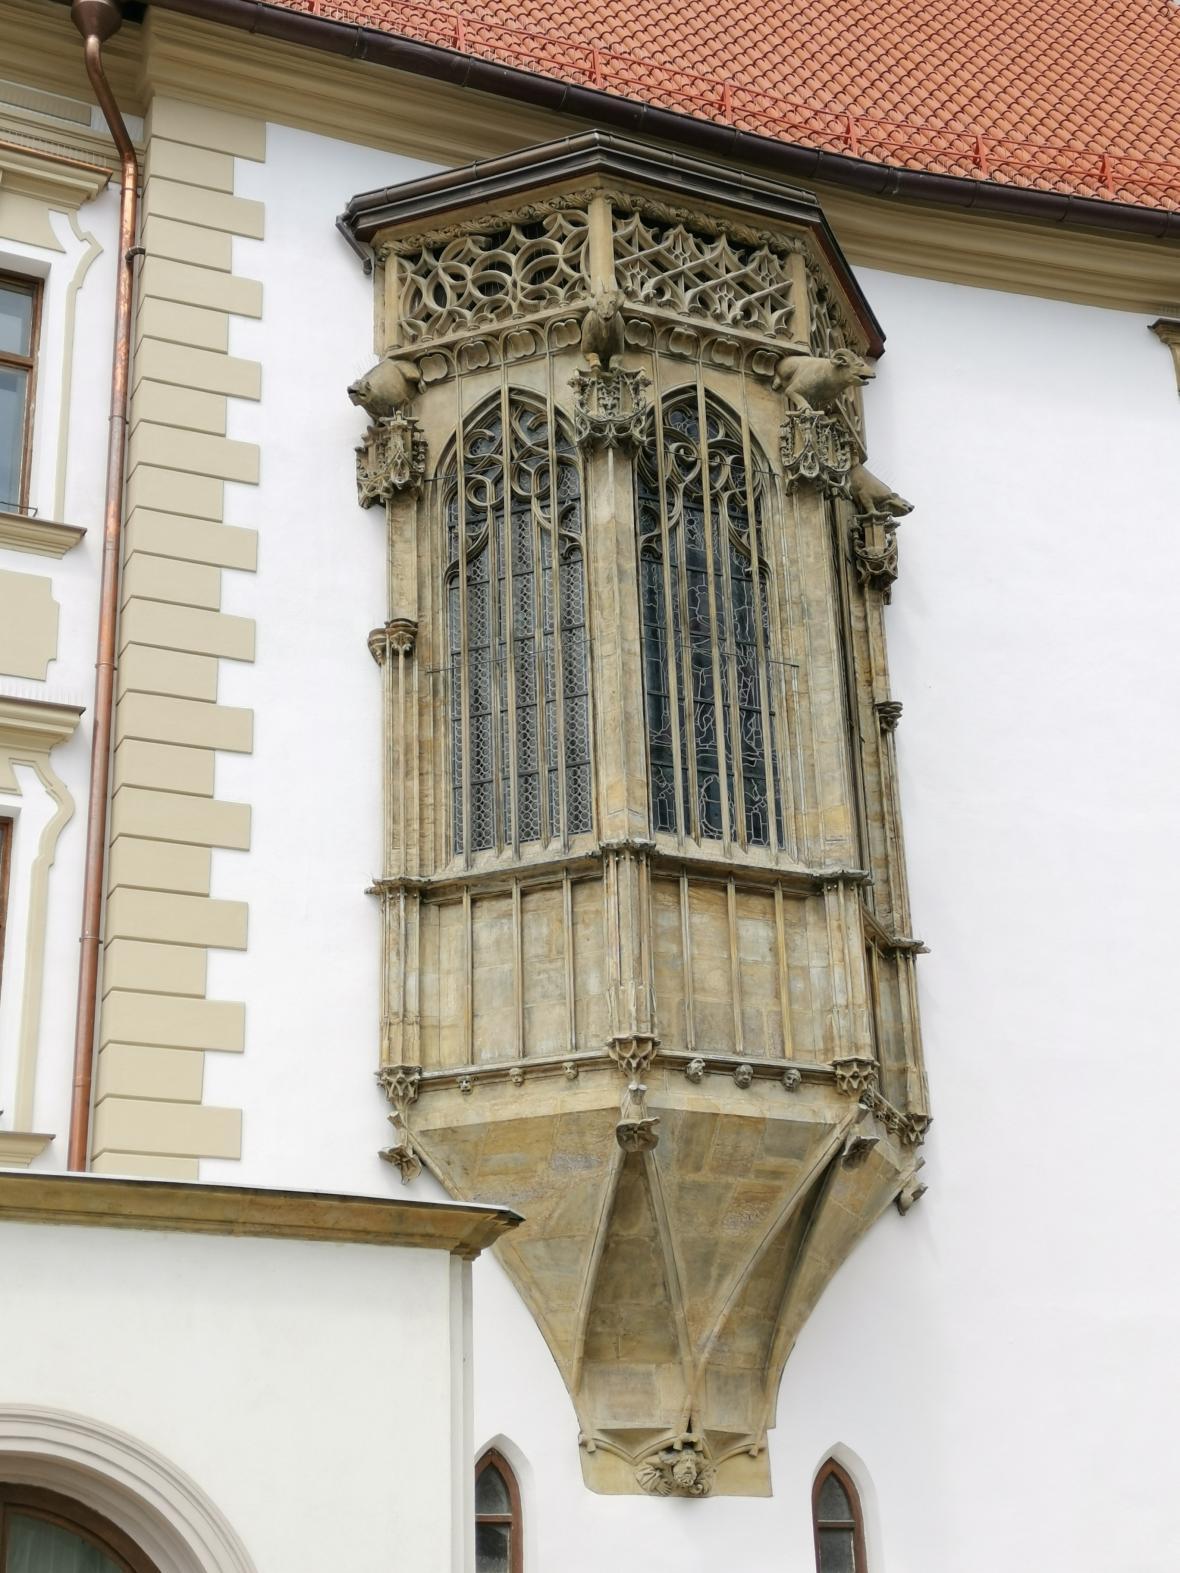 Opravený arkýř a fasáda radnice v Olomouci